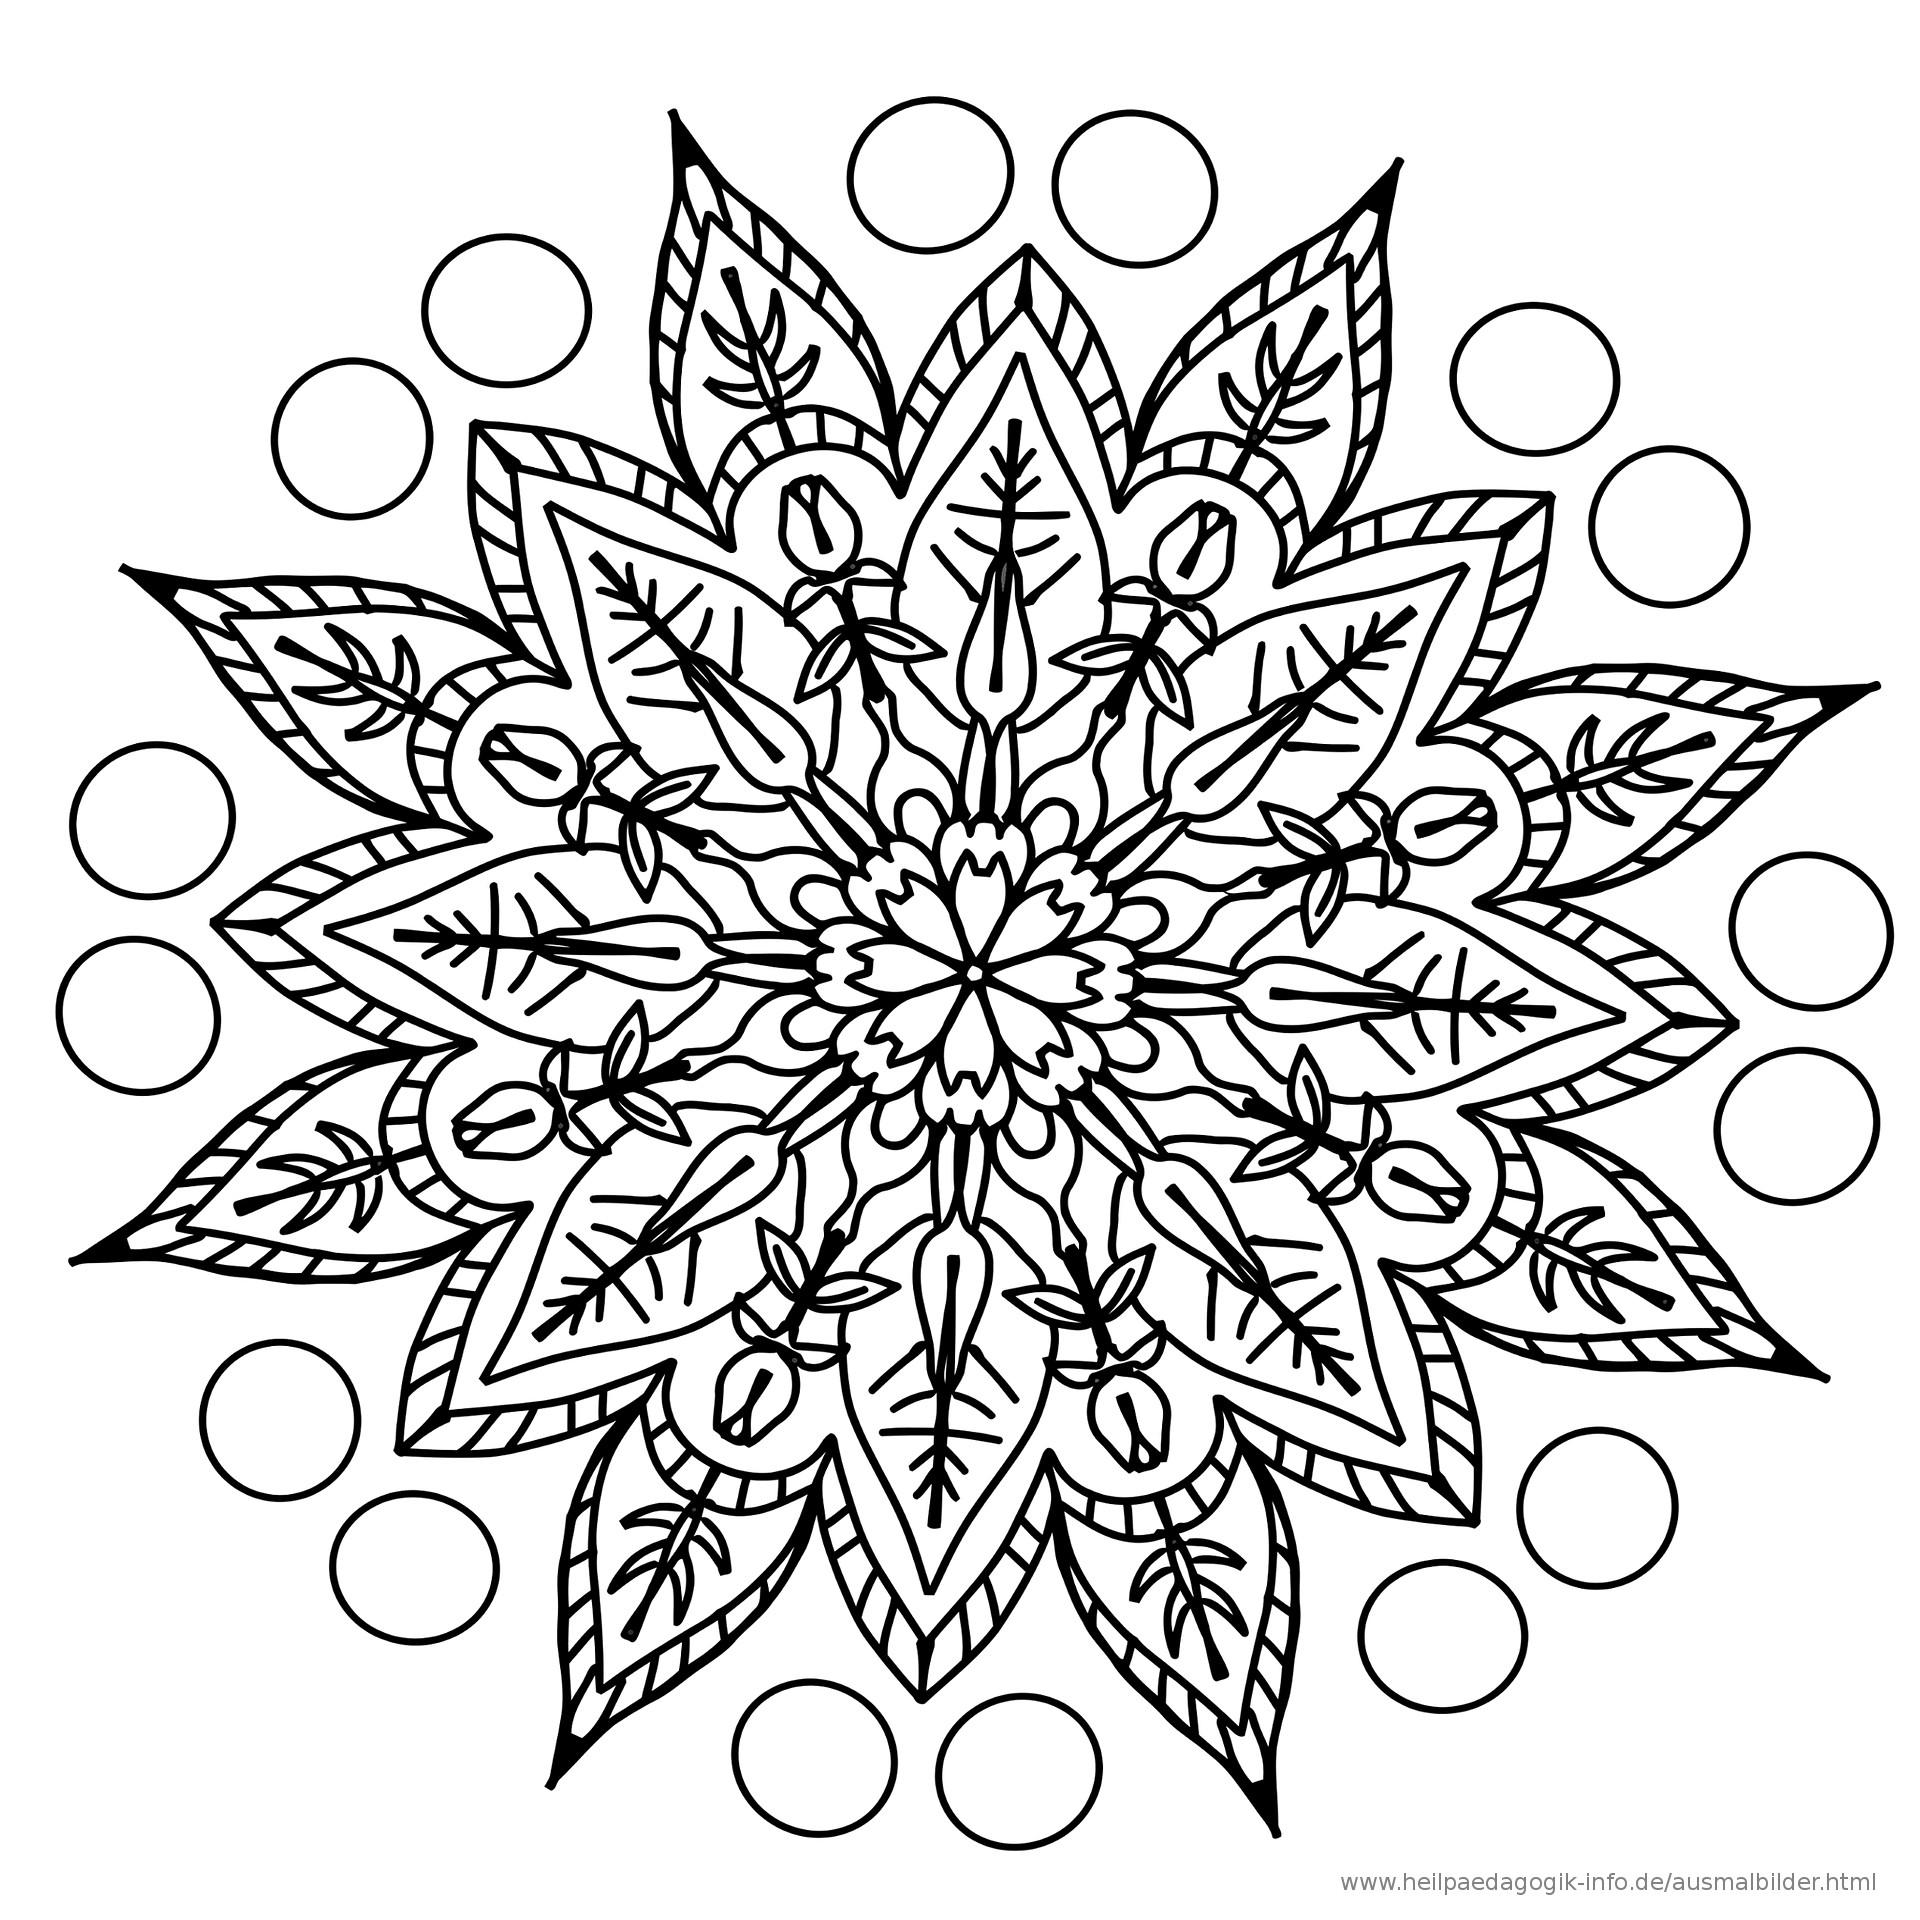 Malvorlagen Mandala  Ausmalbilder Mandalas